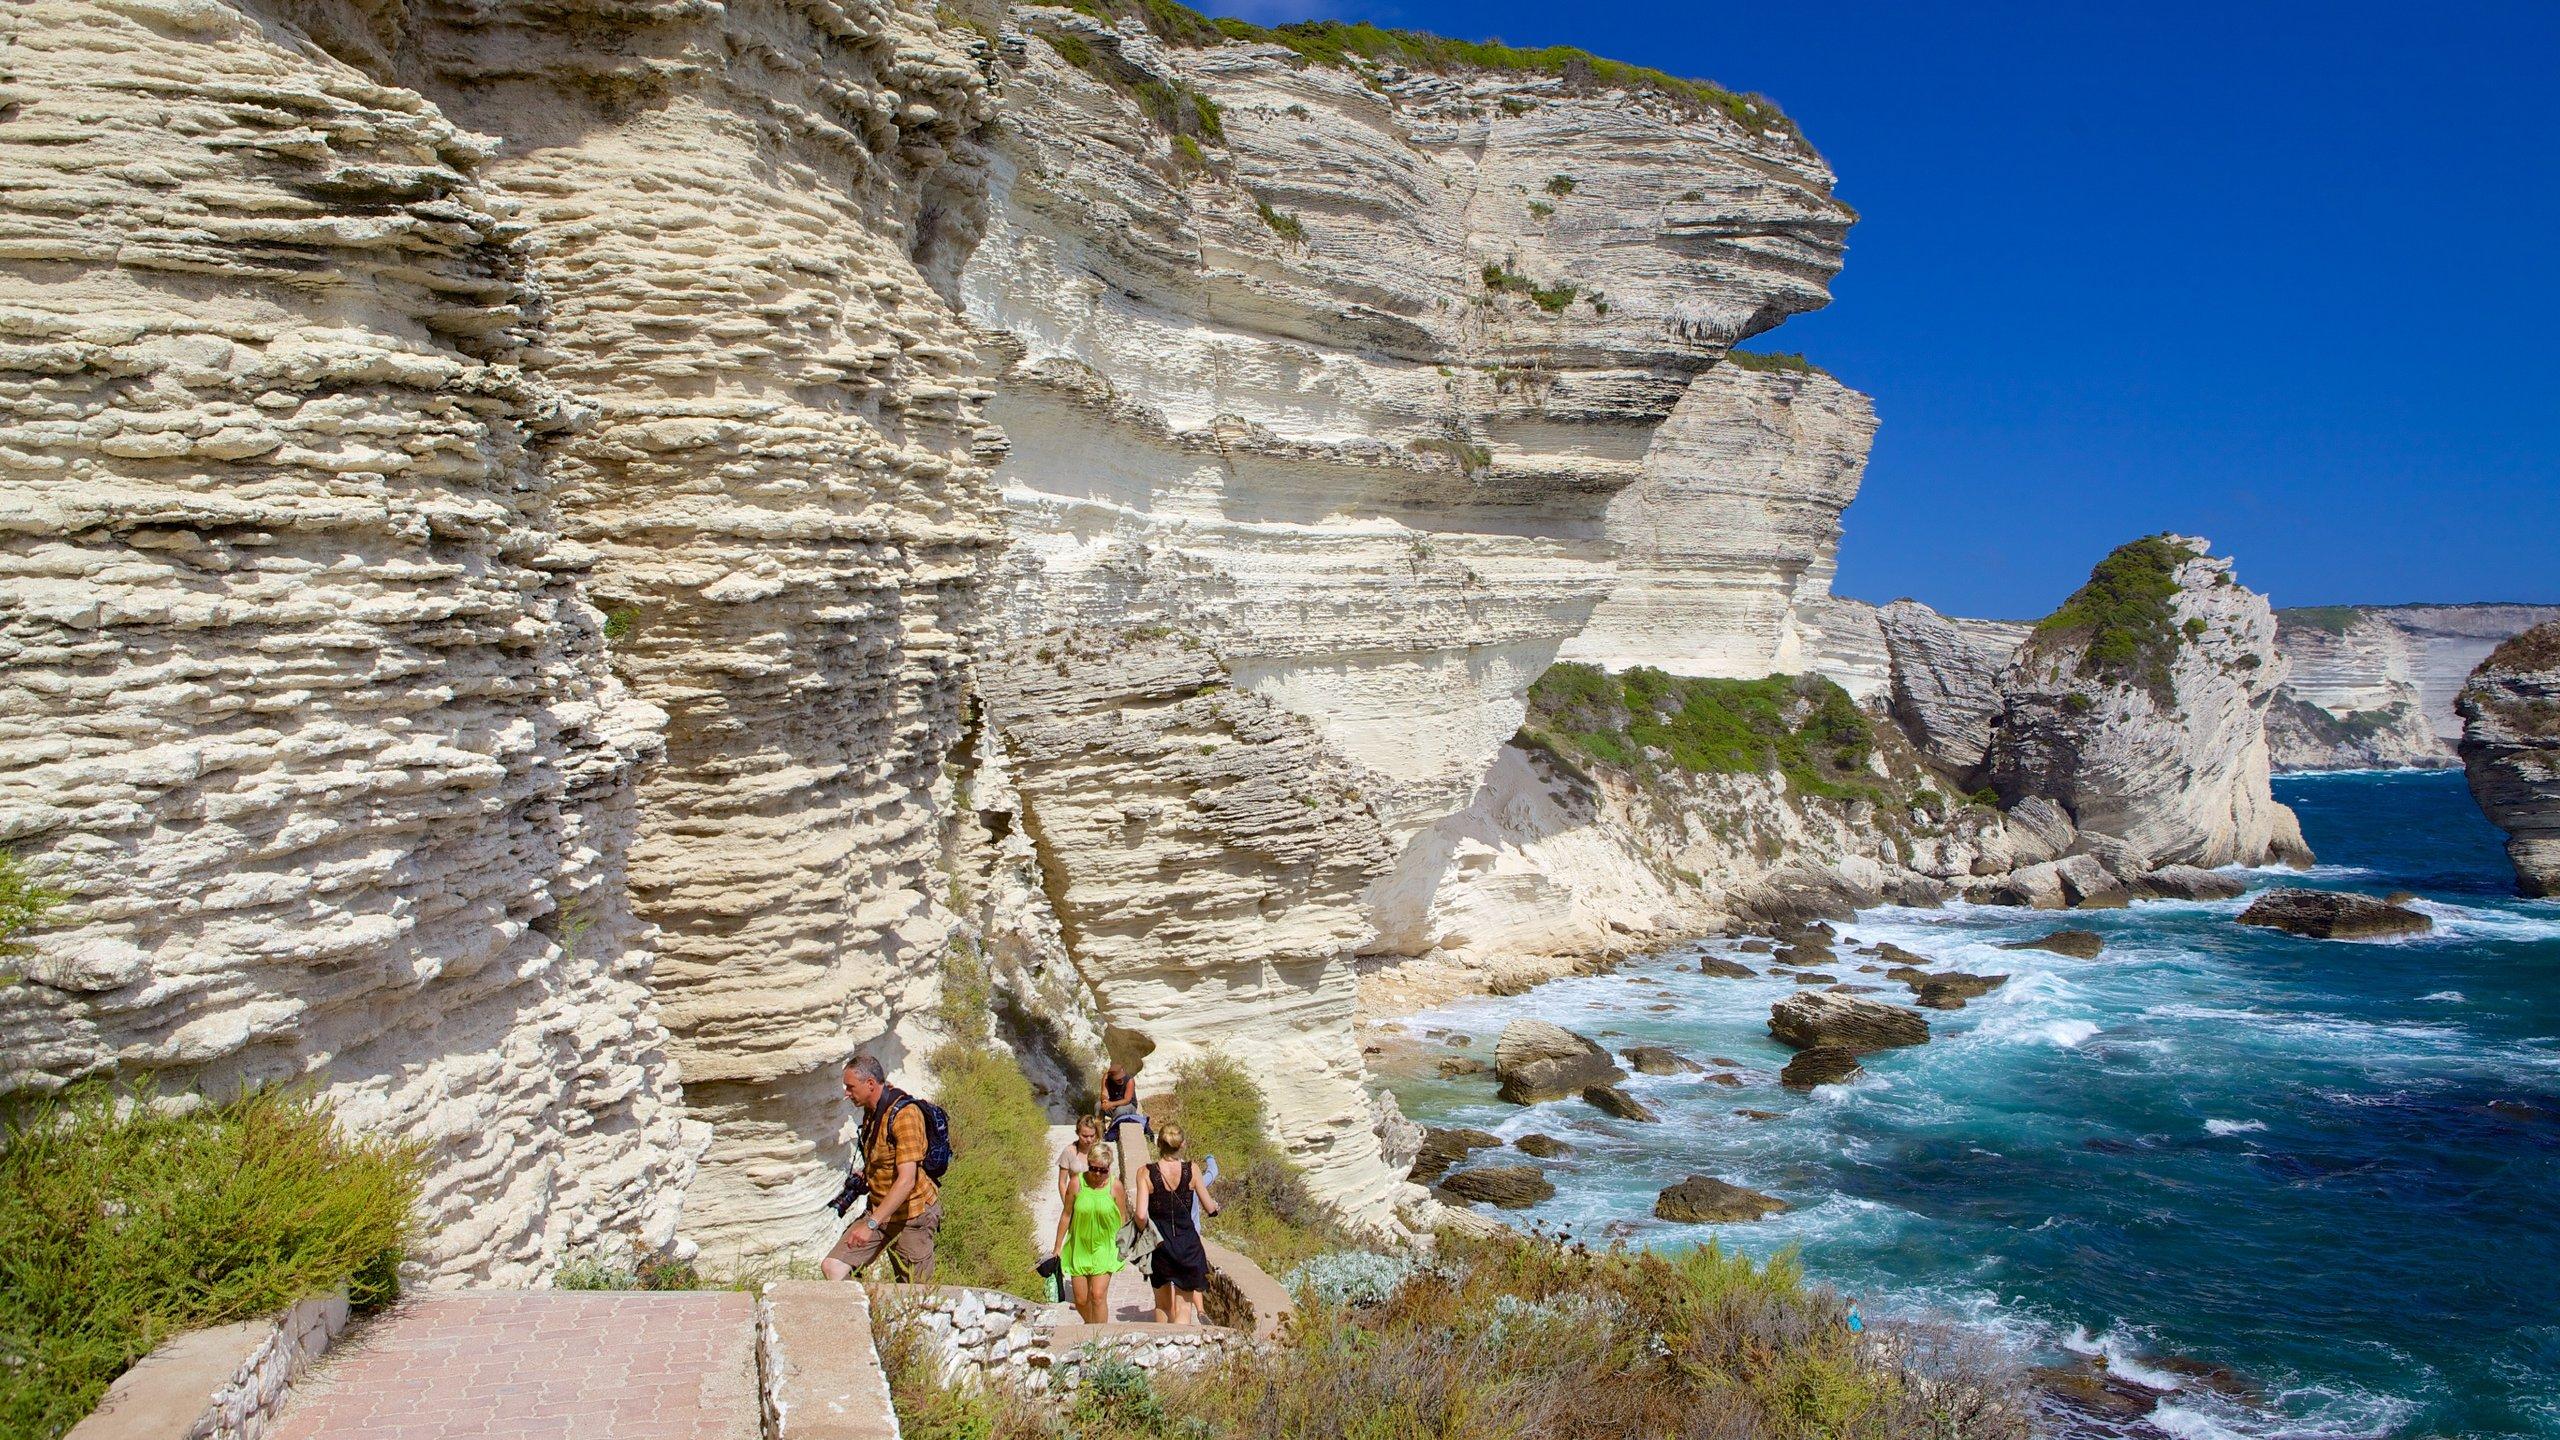 Bonifacio, Corse-du-Sud, France